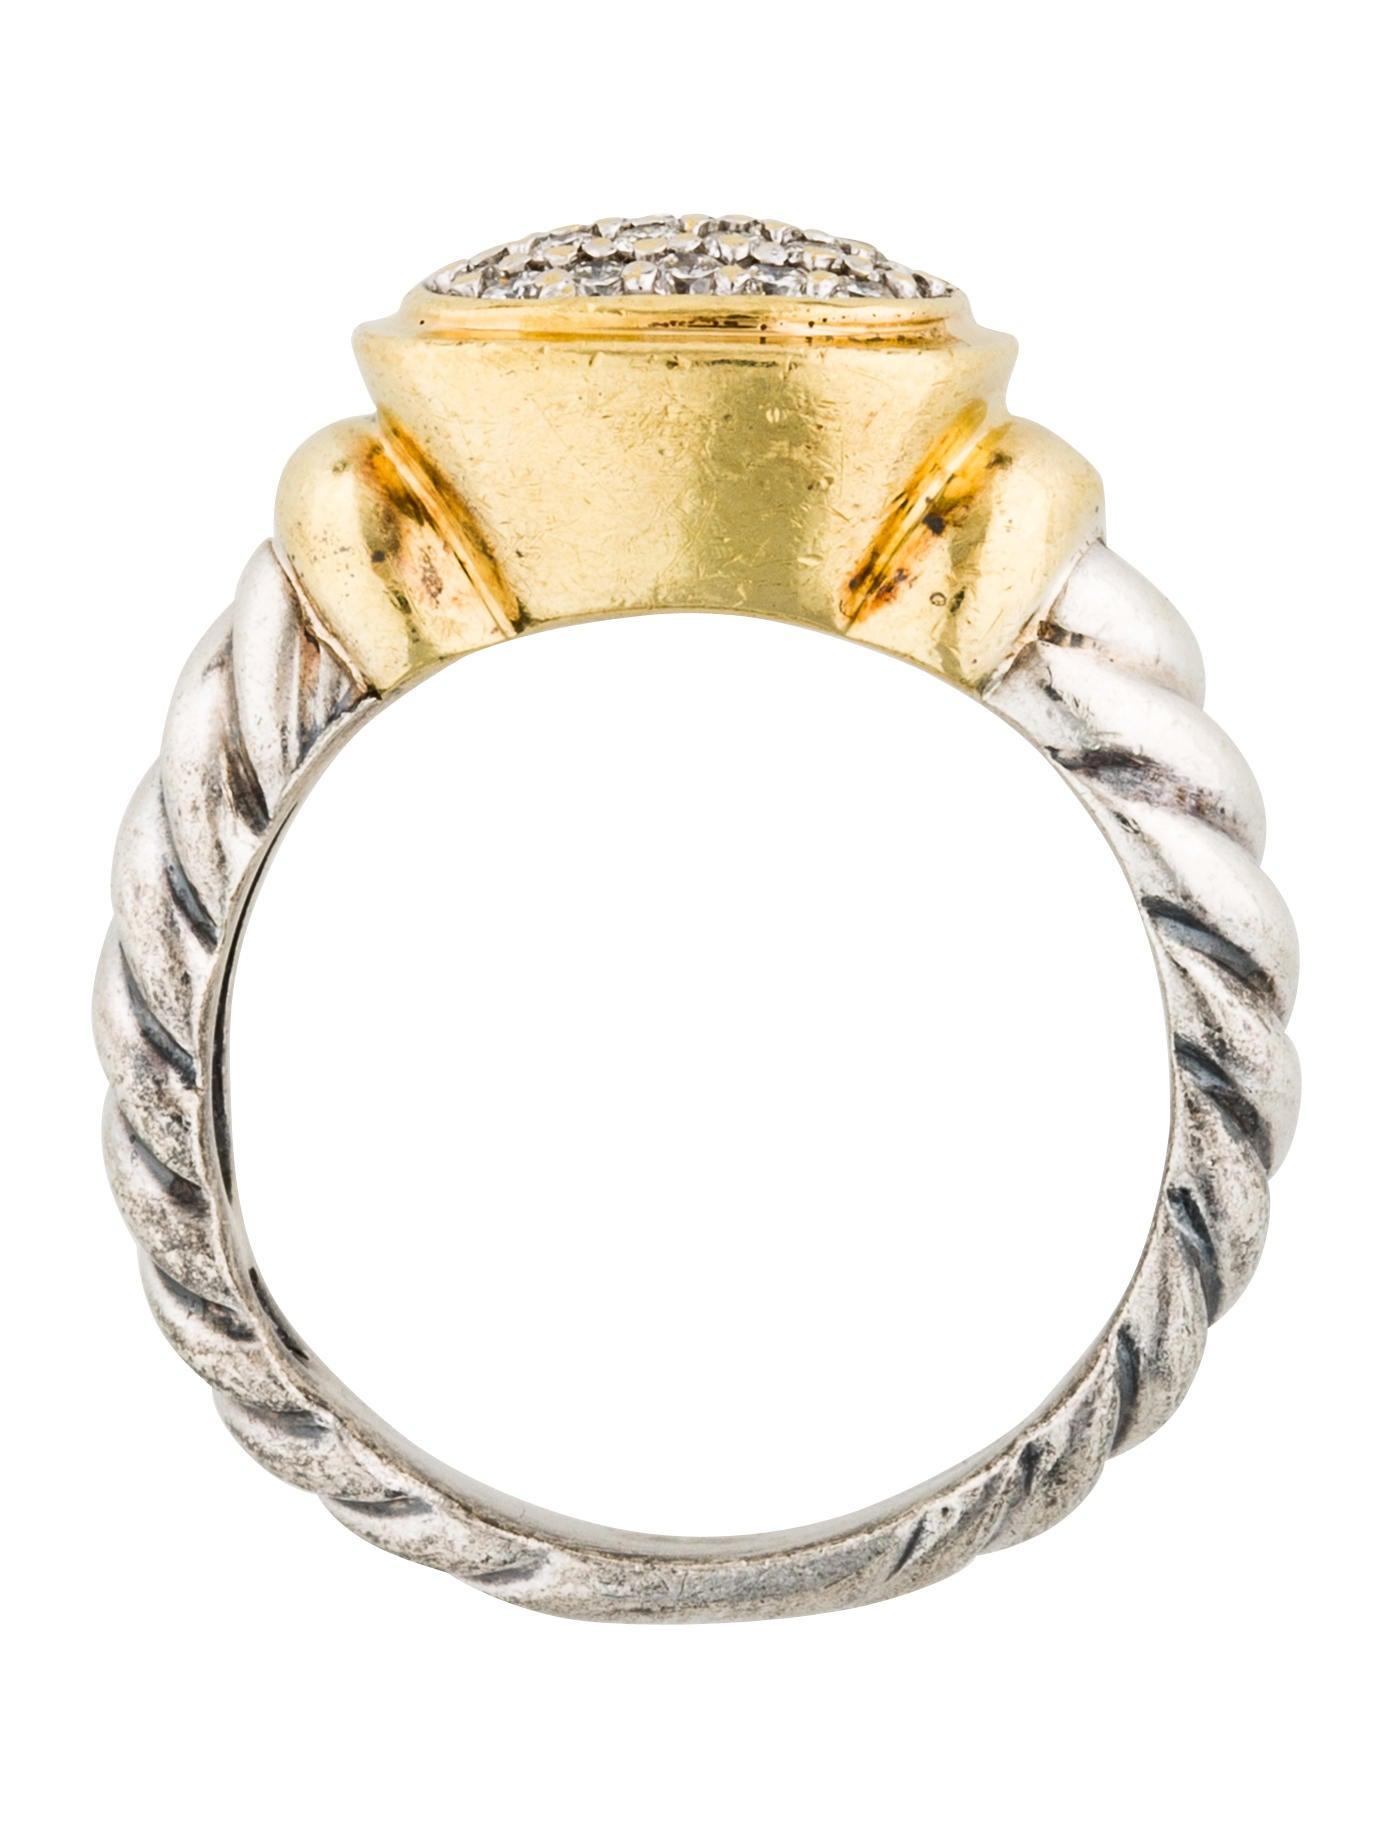 David yurman two tone noblesse ring rings dvy42248 for David yurman inspired jewelry rings